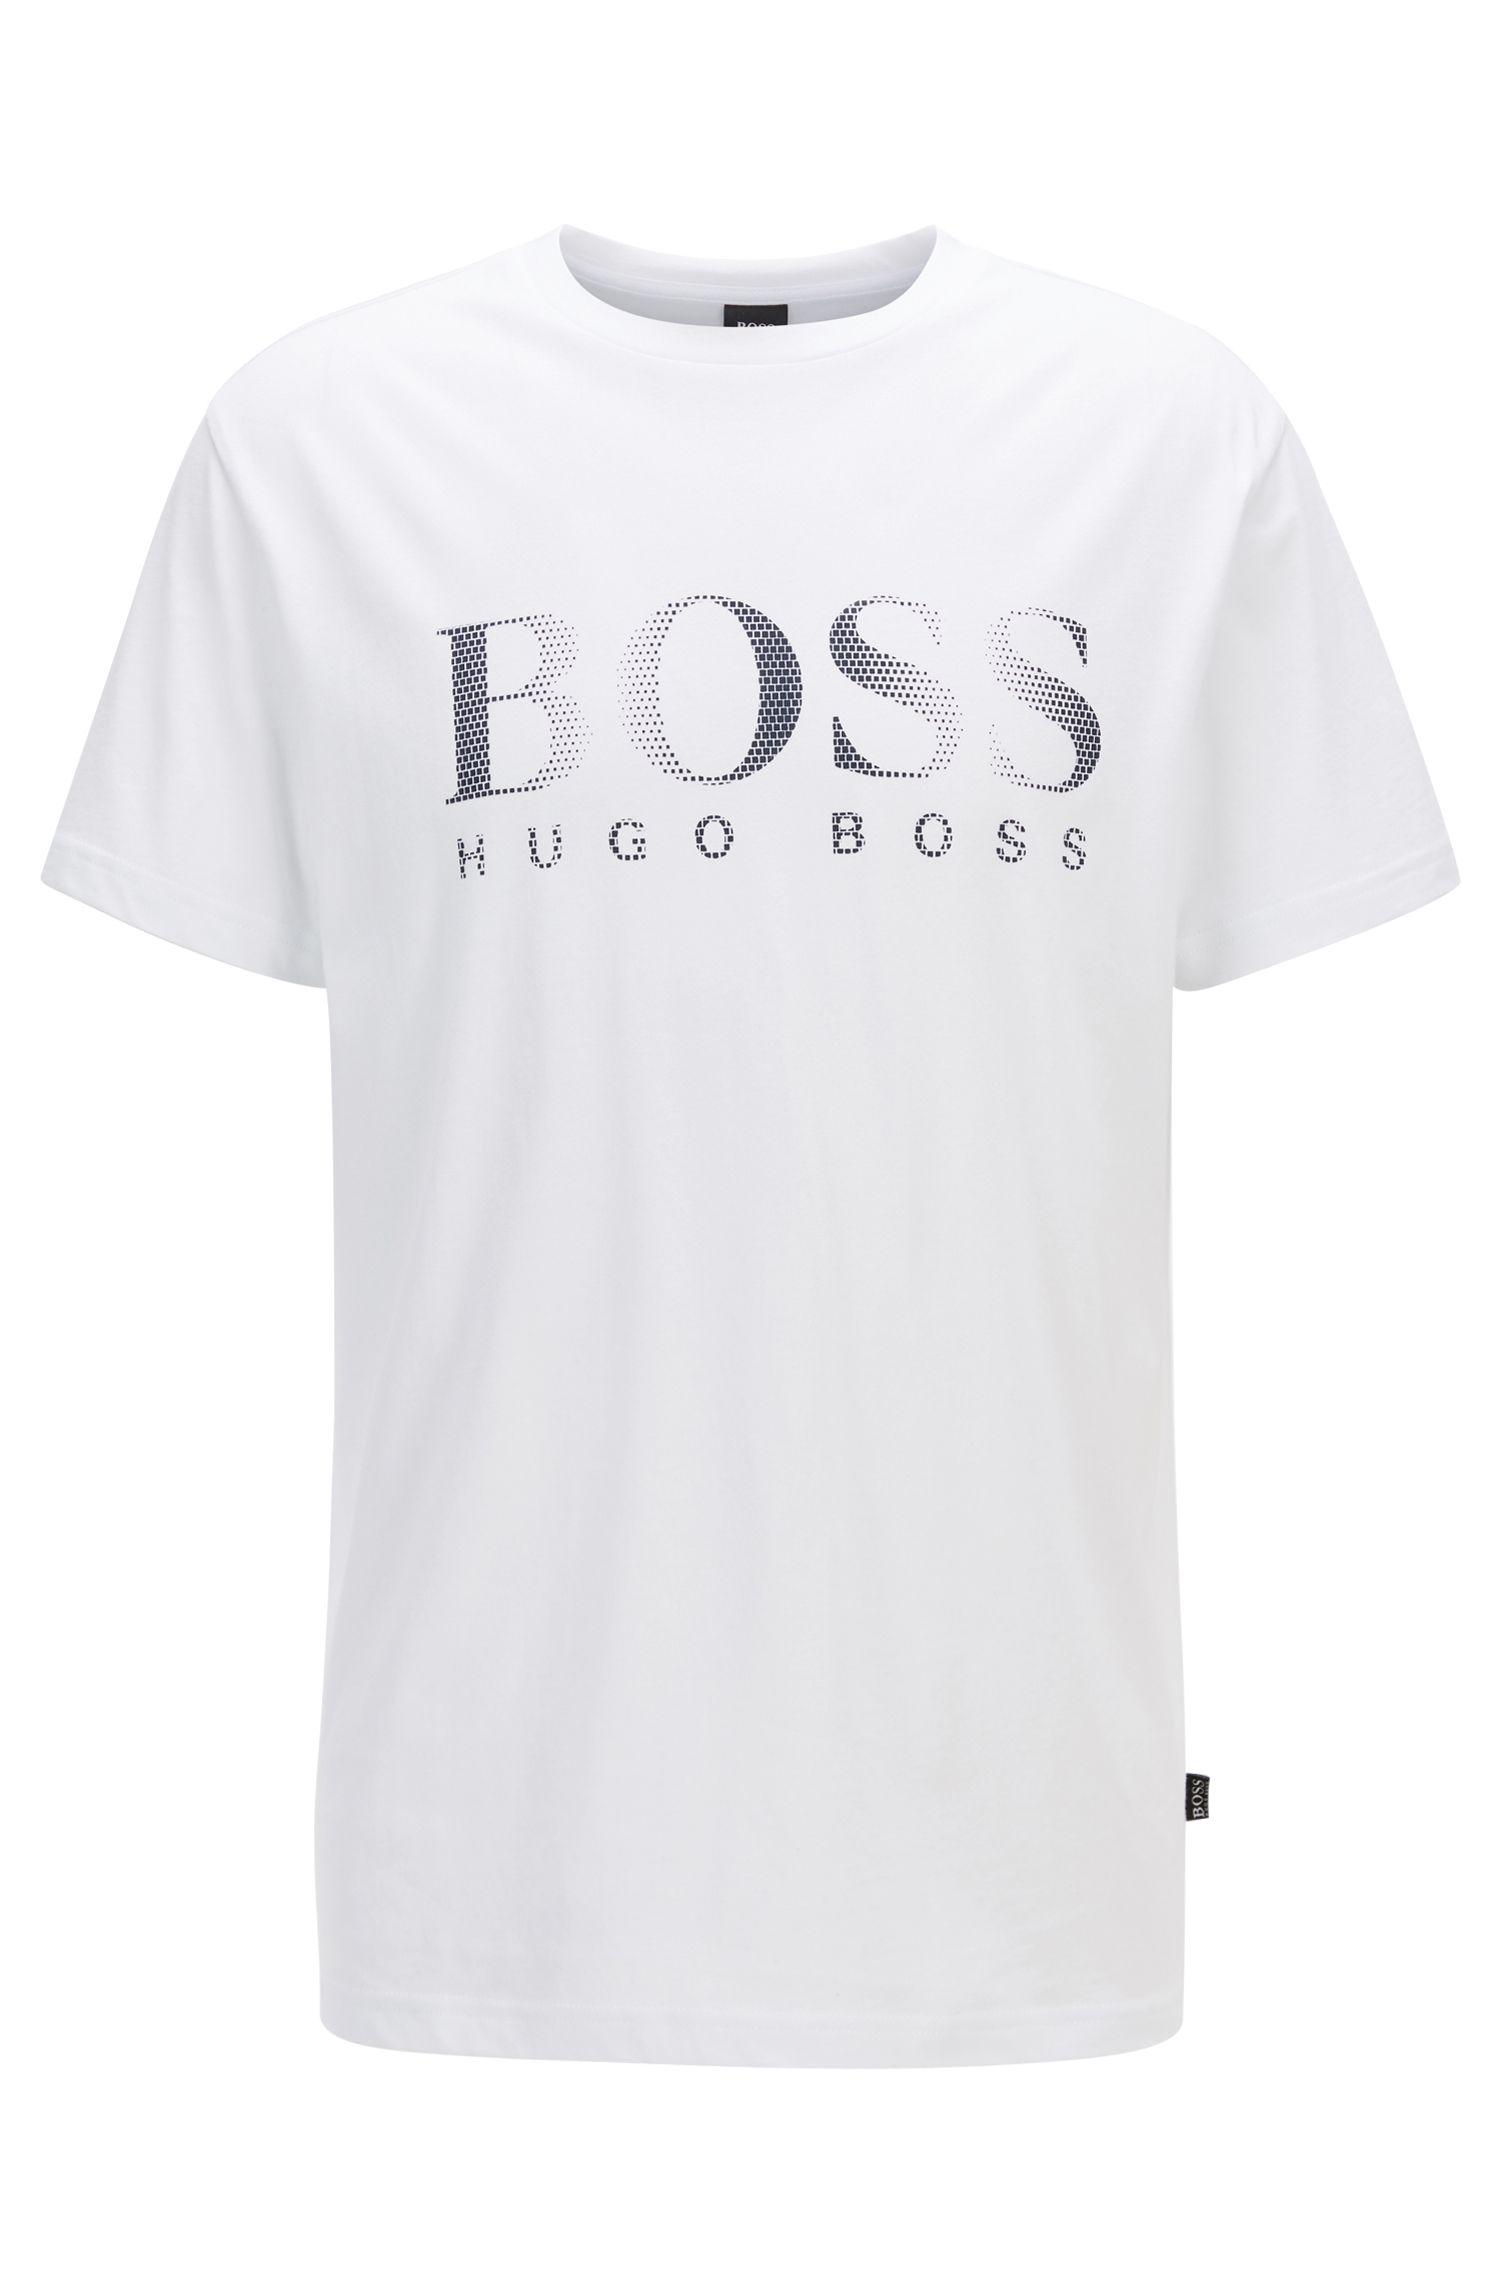 T-shirt Relaxed Fit en coton avec protection anti-UV